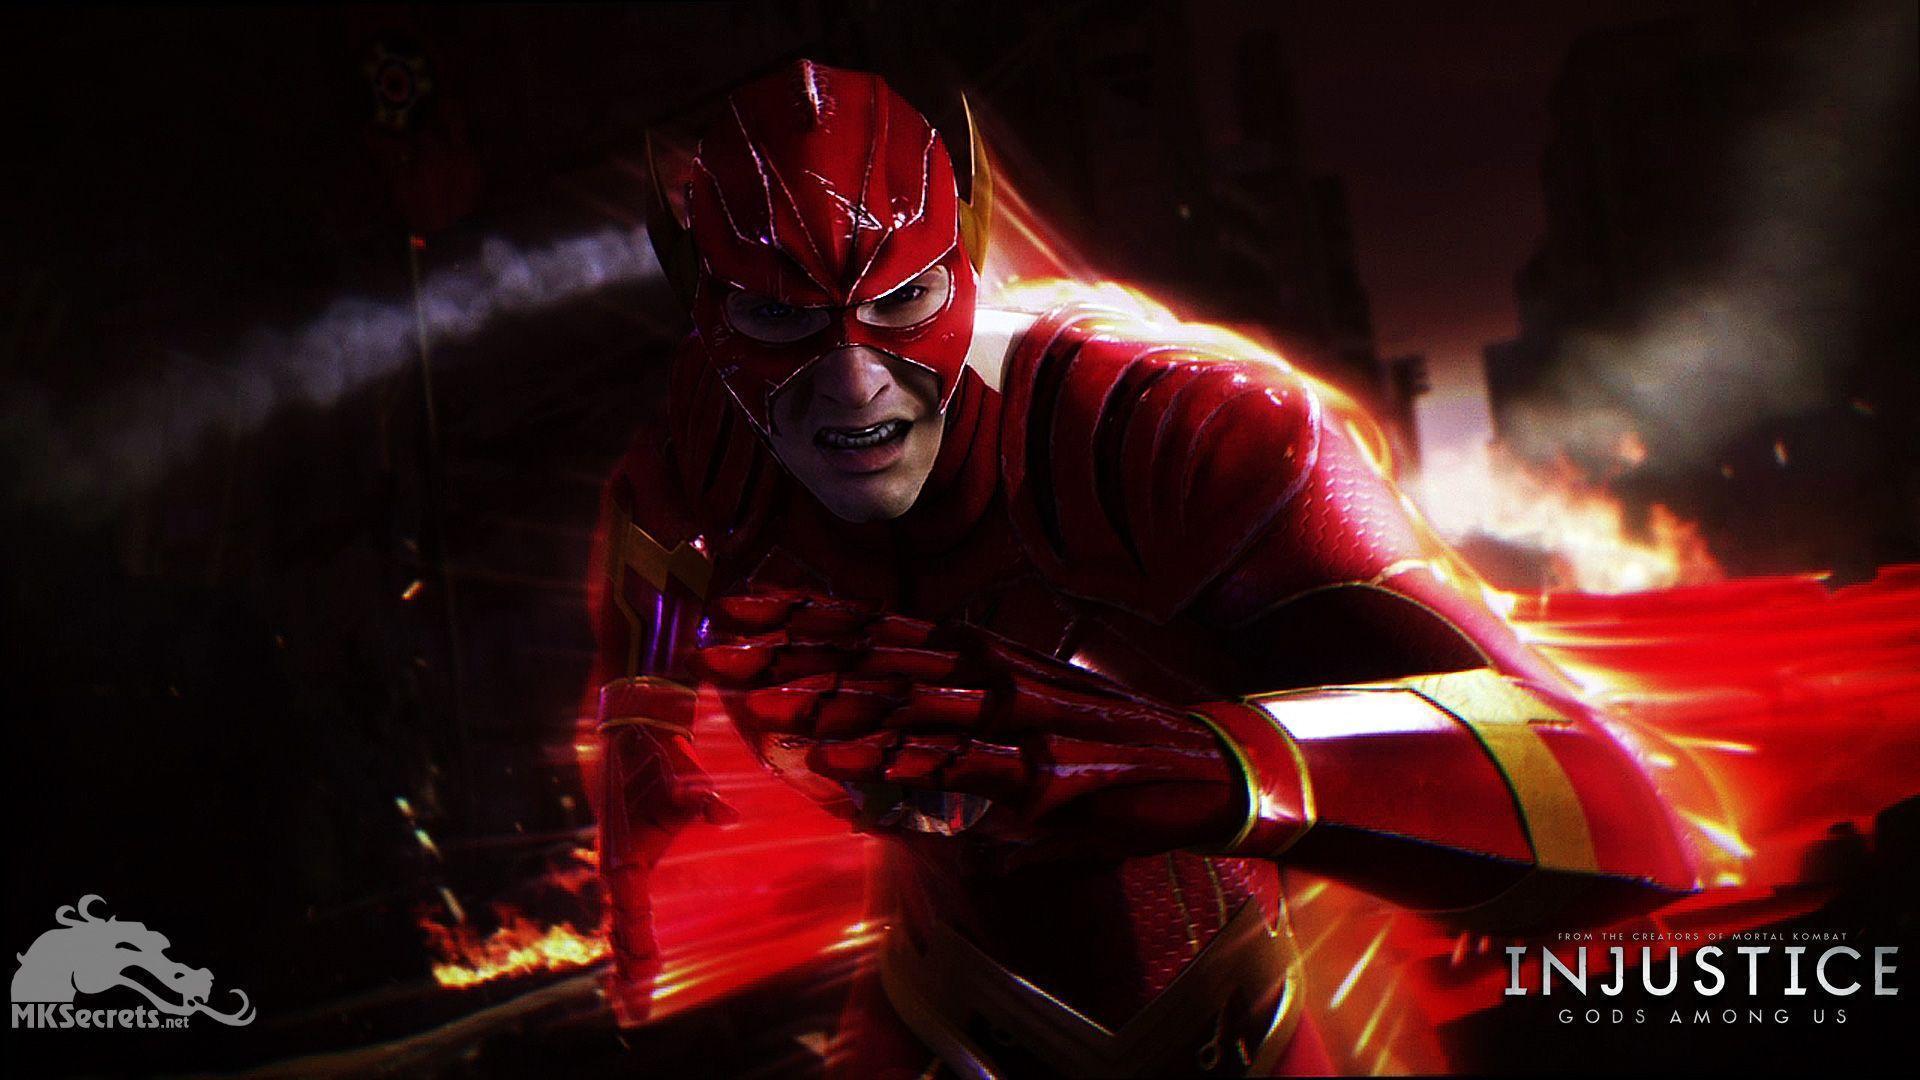 Injustice-Gods-Among-Us-Wallpaper-The-Flash.jpg